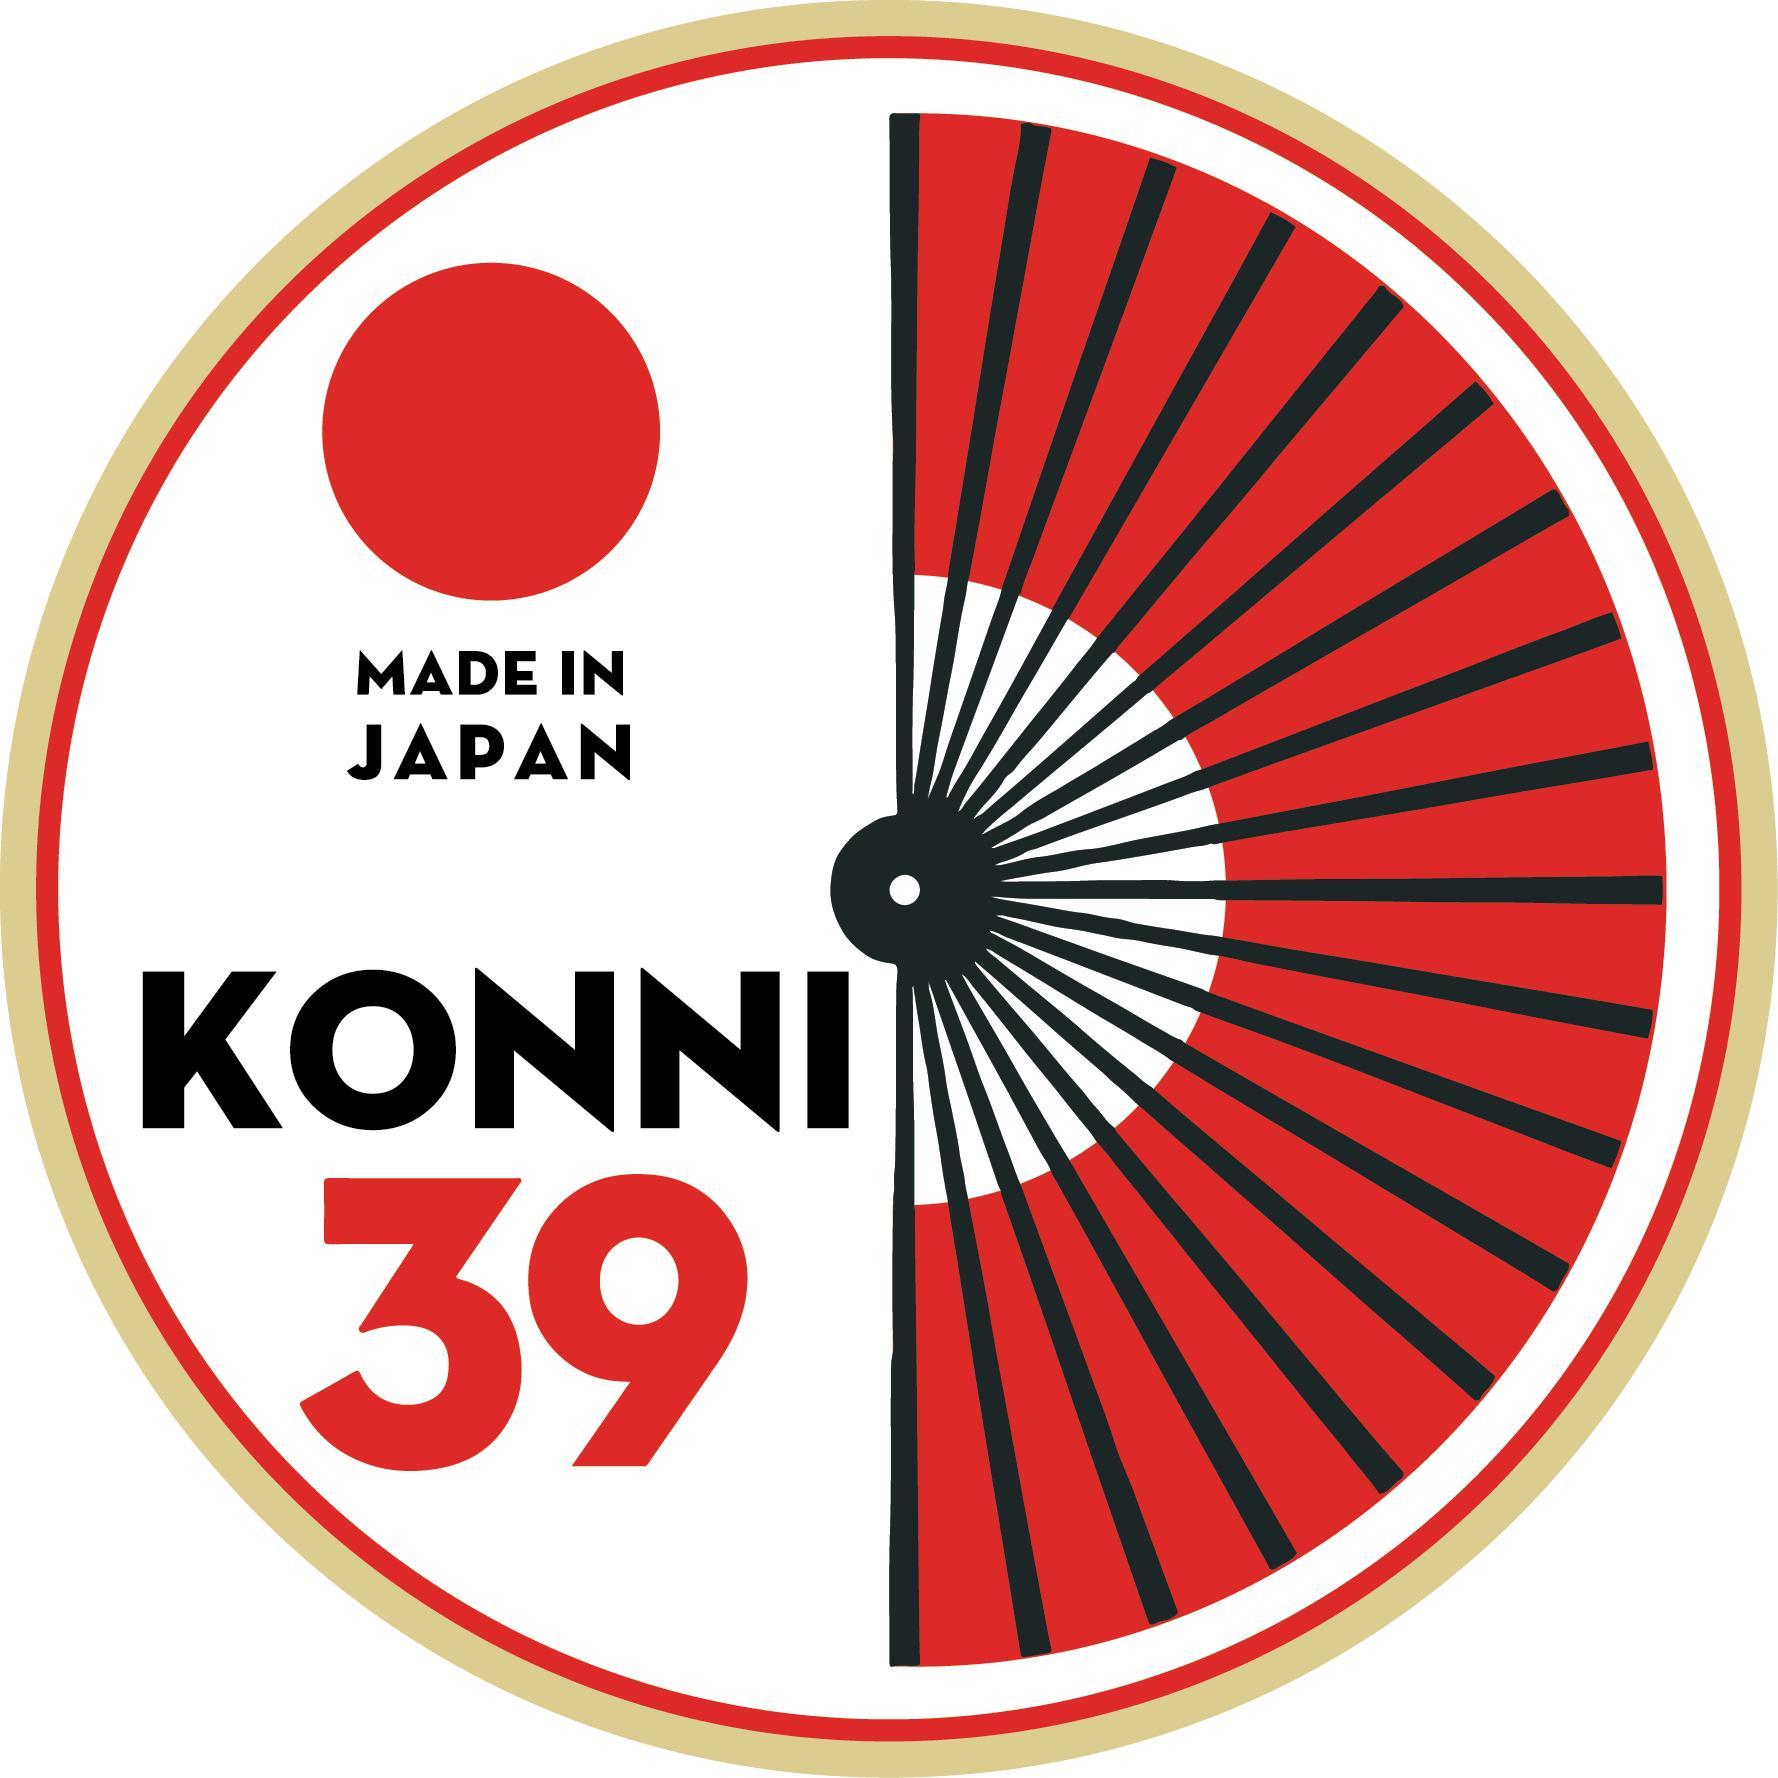 Konnie39